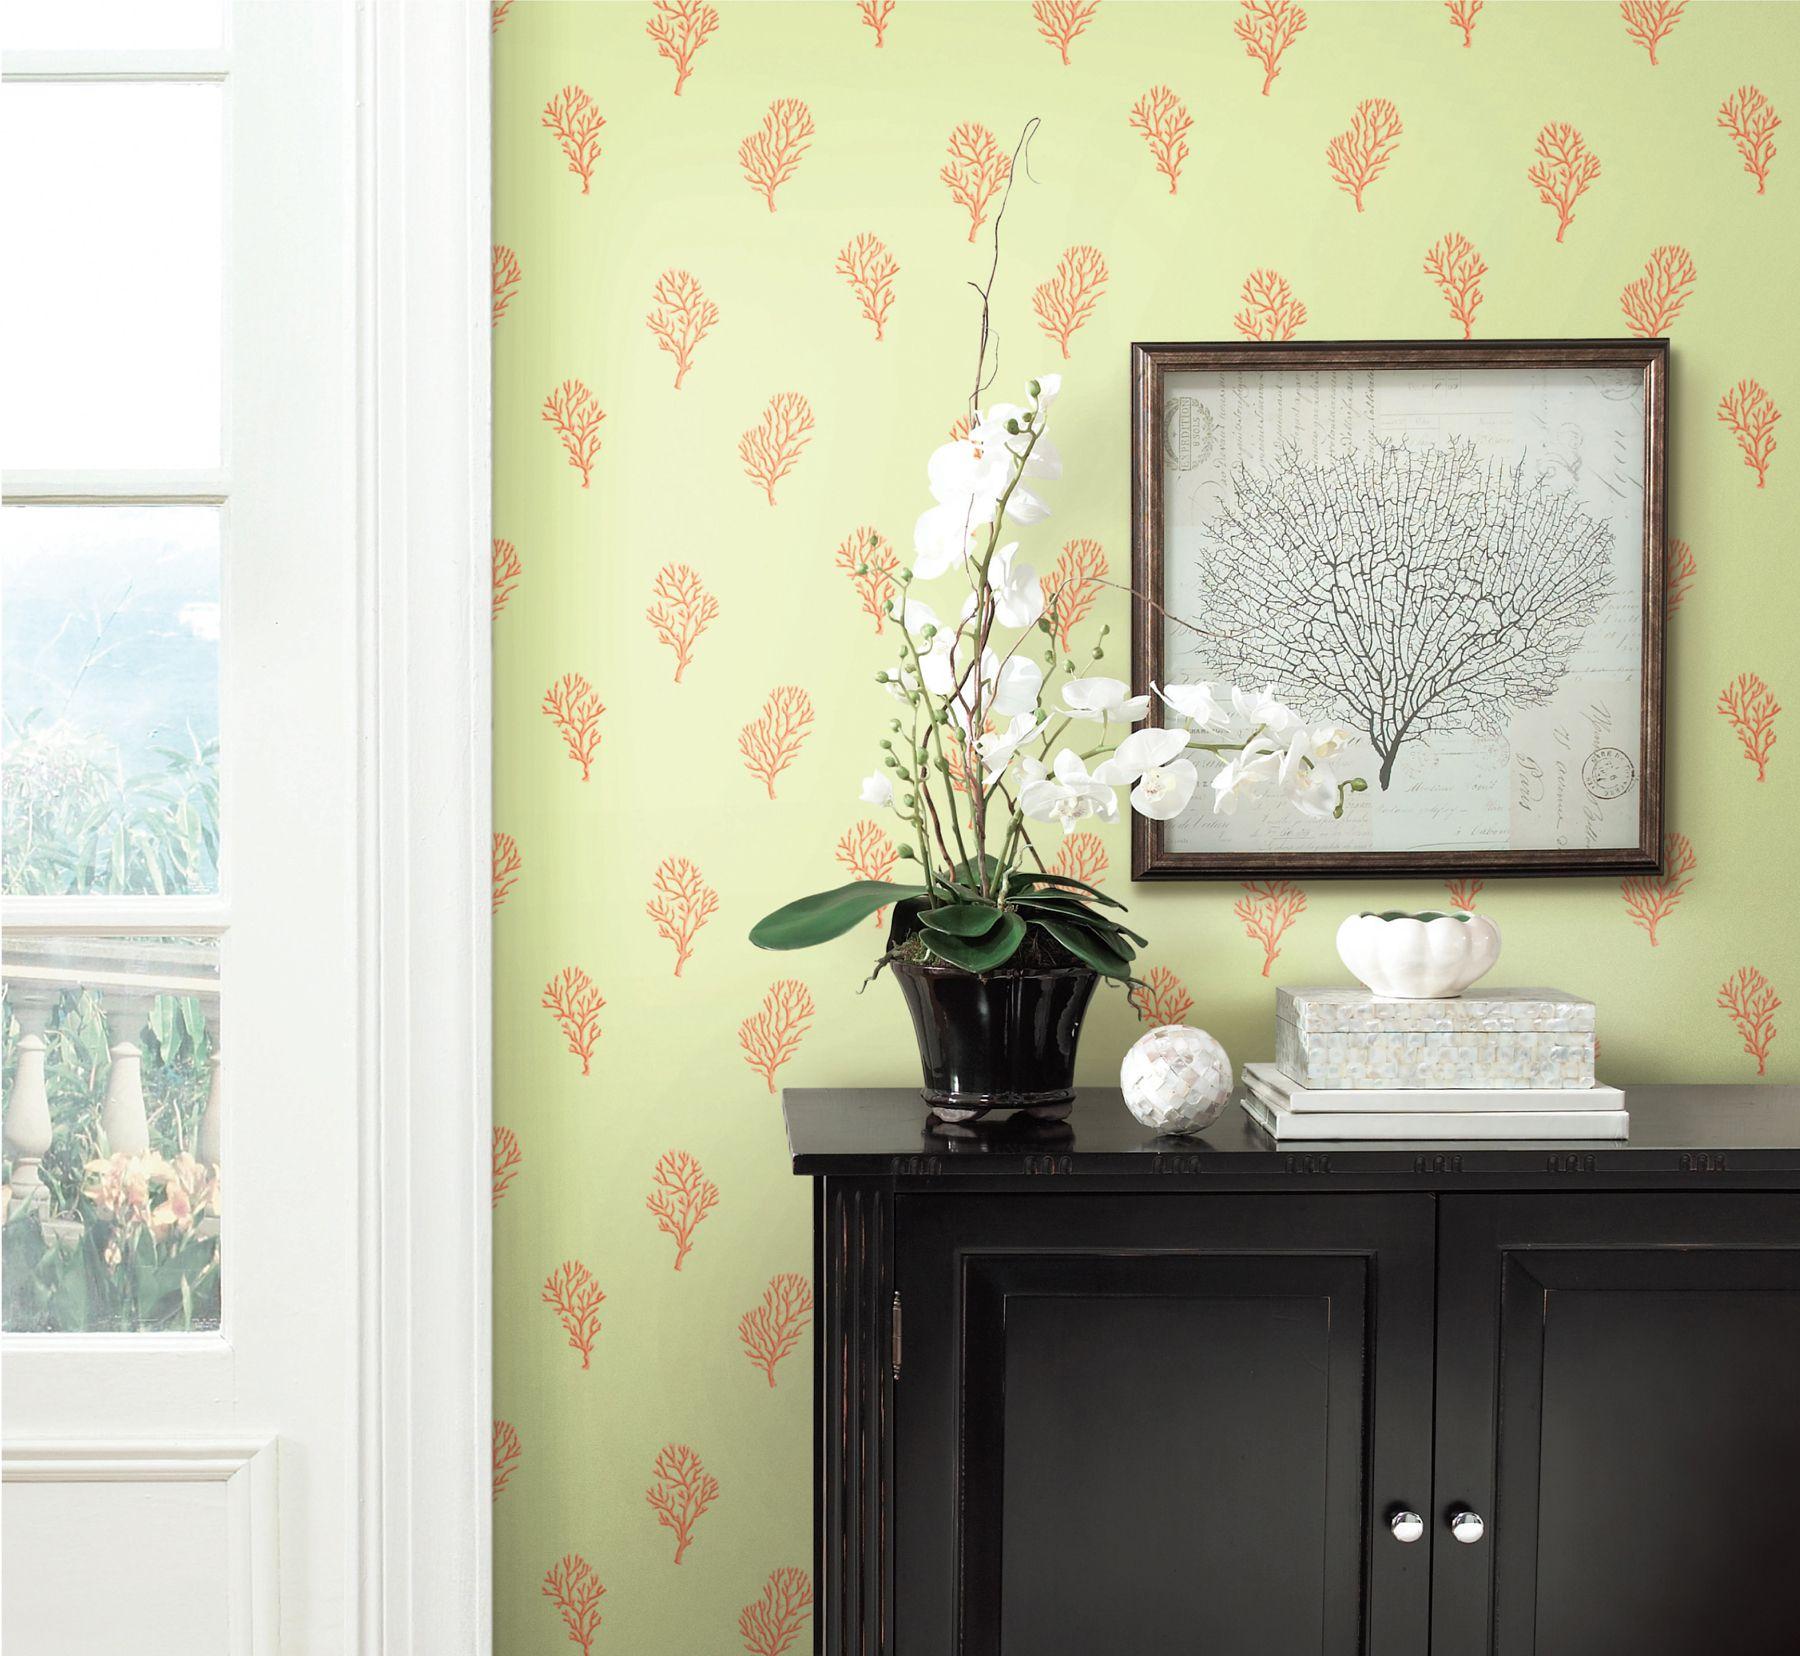 Islamorada Green Coral Branch Wallpaper Pattern DLR54664